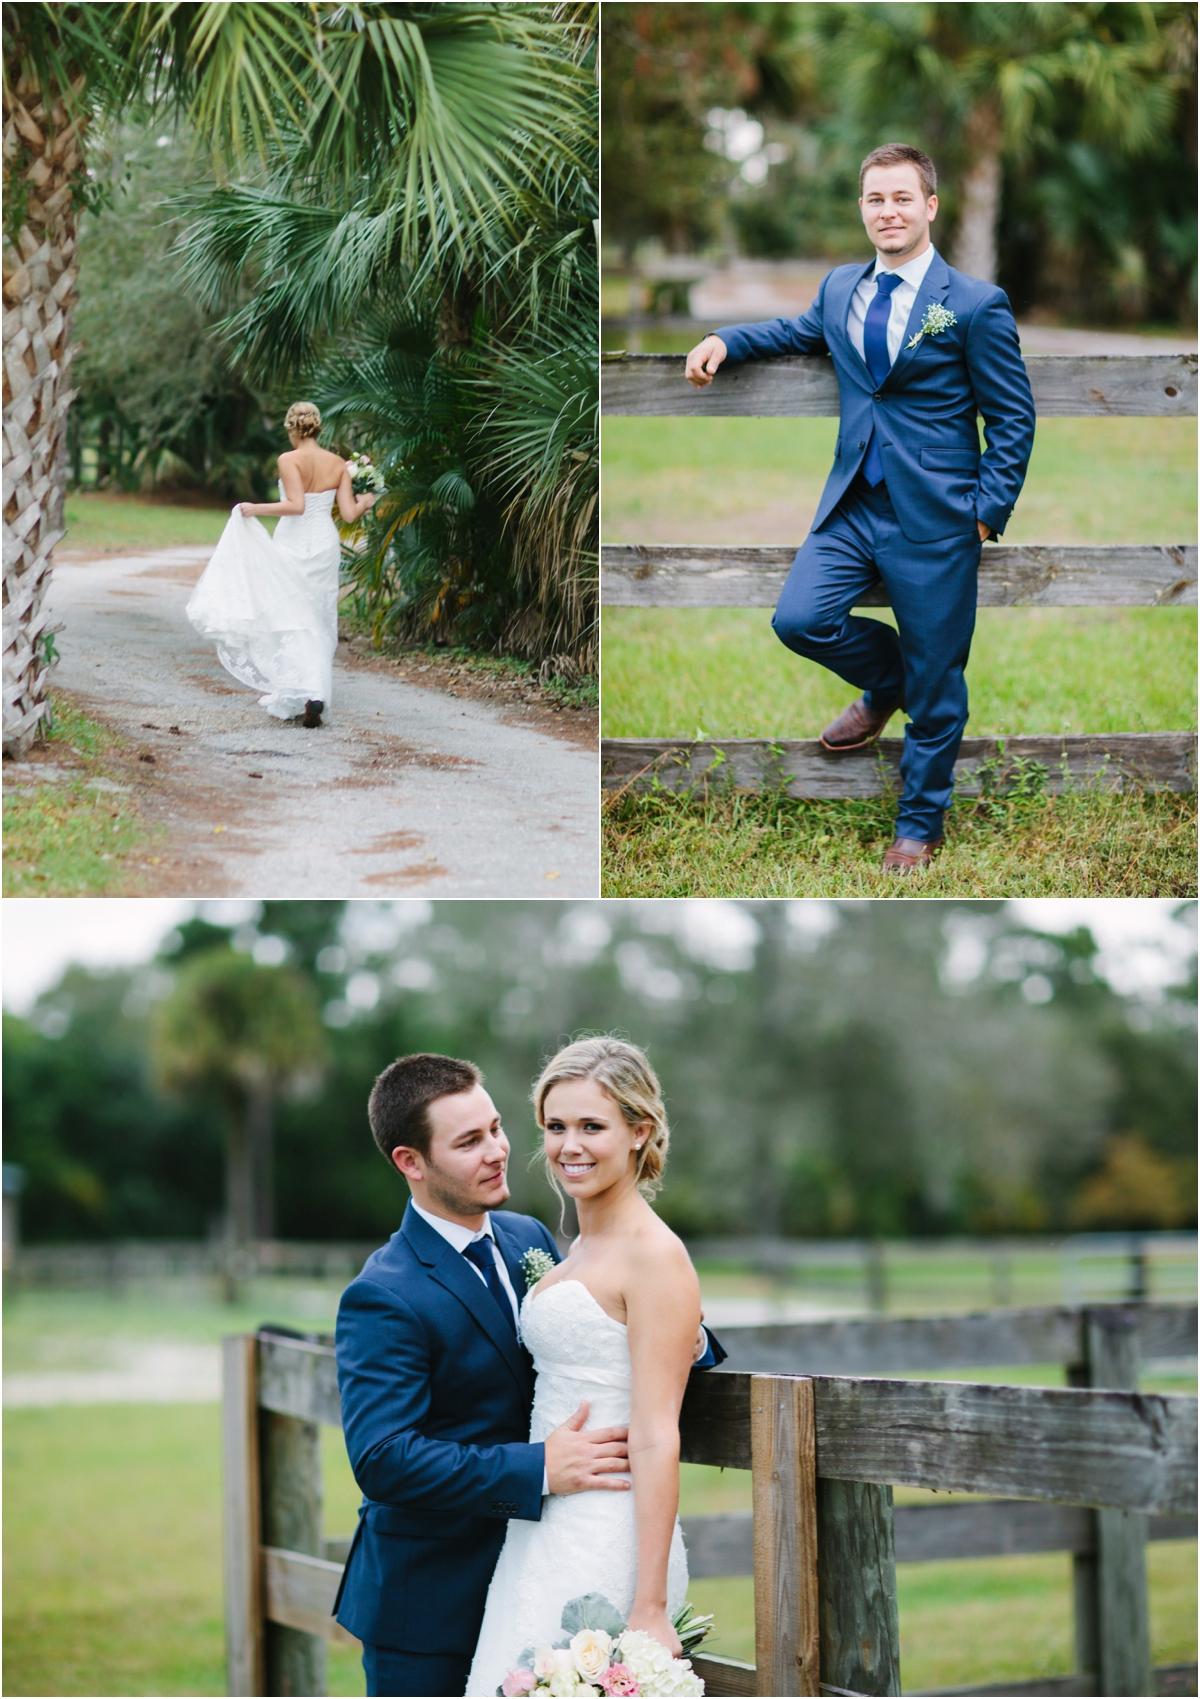 South_Florida_Wedding_Southern_Palm_0025